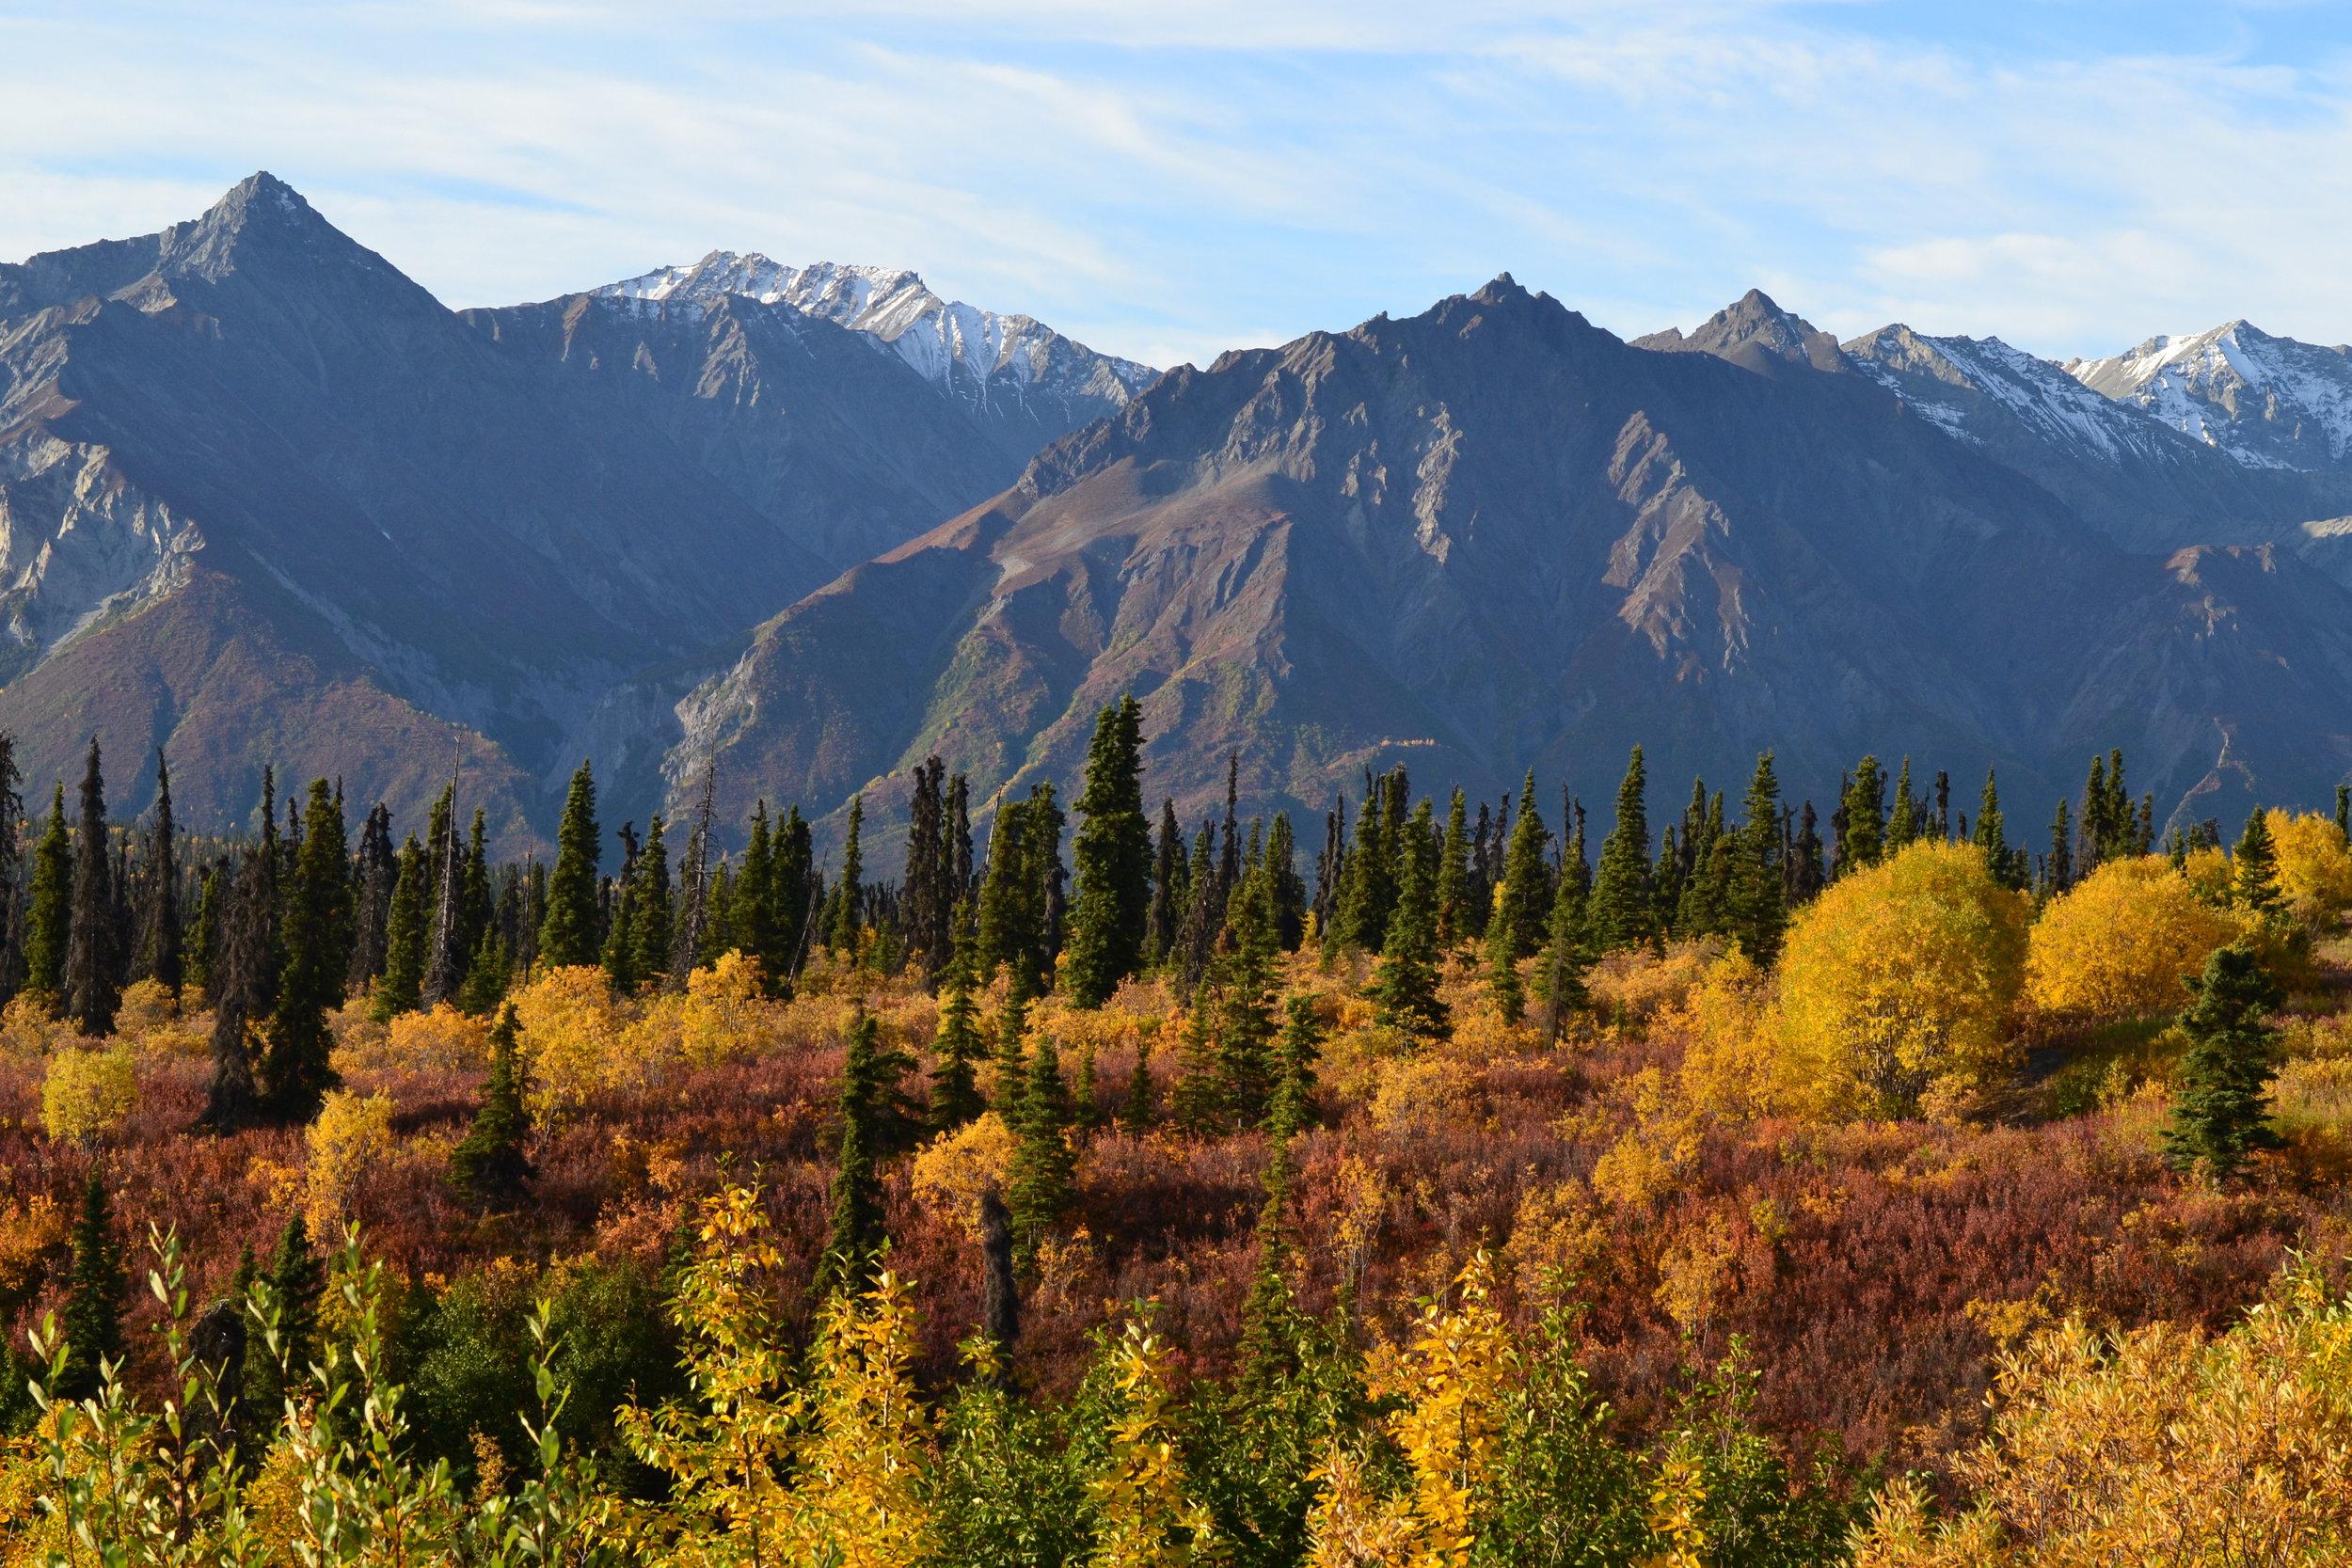 Fall foliage in the Wrangells